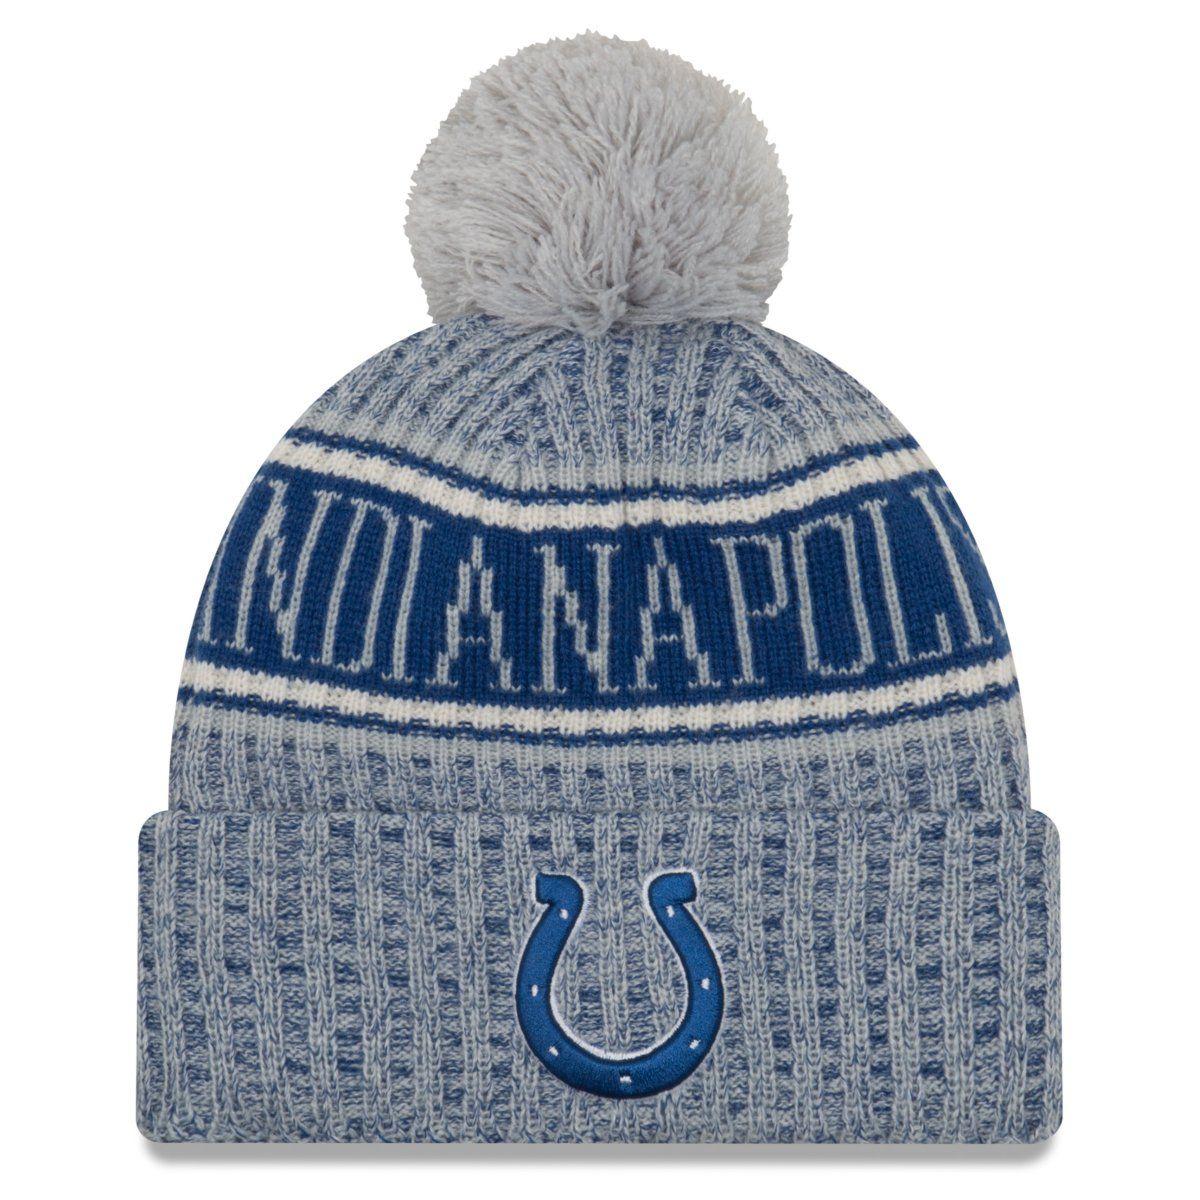 amfoo - New Era NFL Sideline Reverse Mütze - Indianapolis Colts